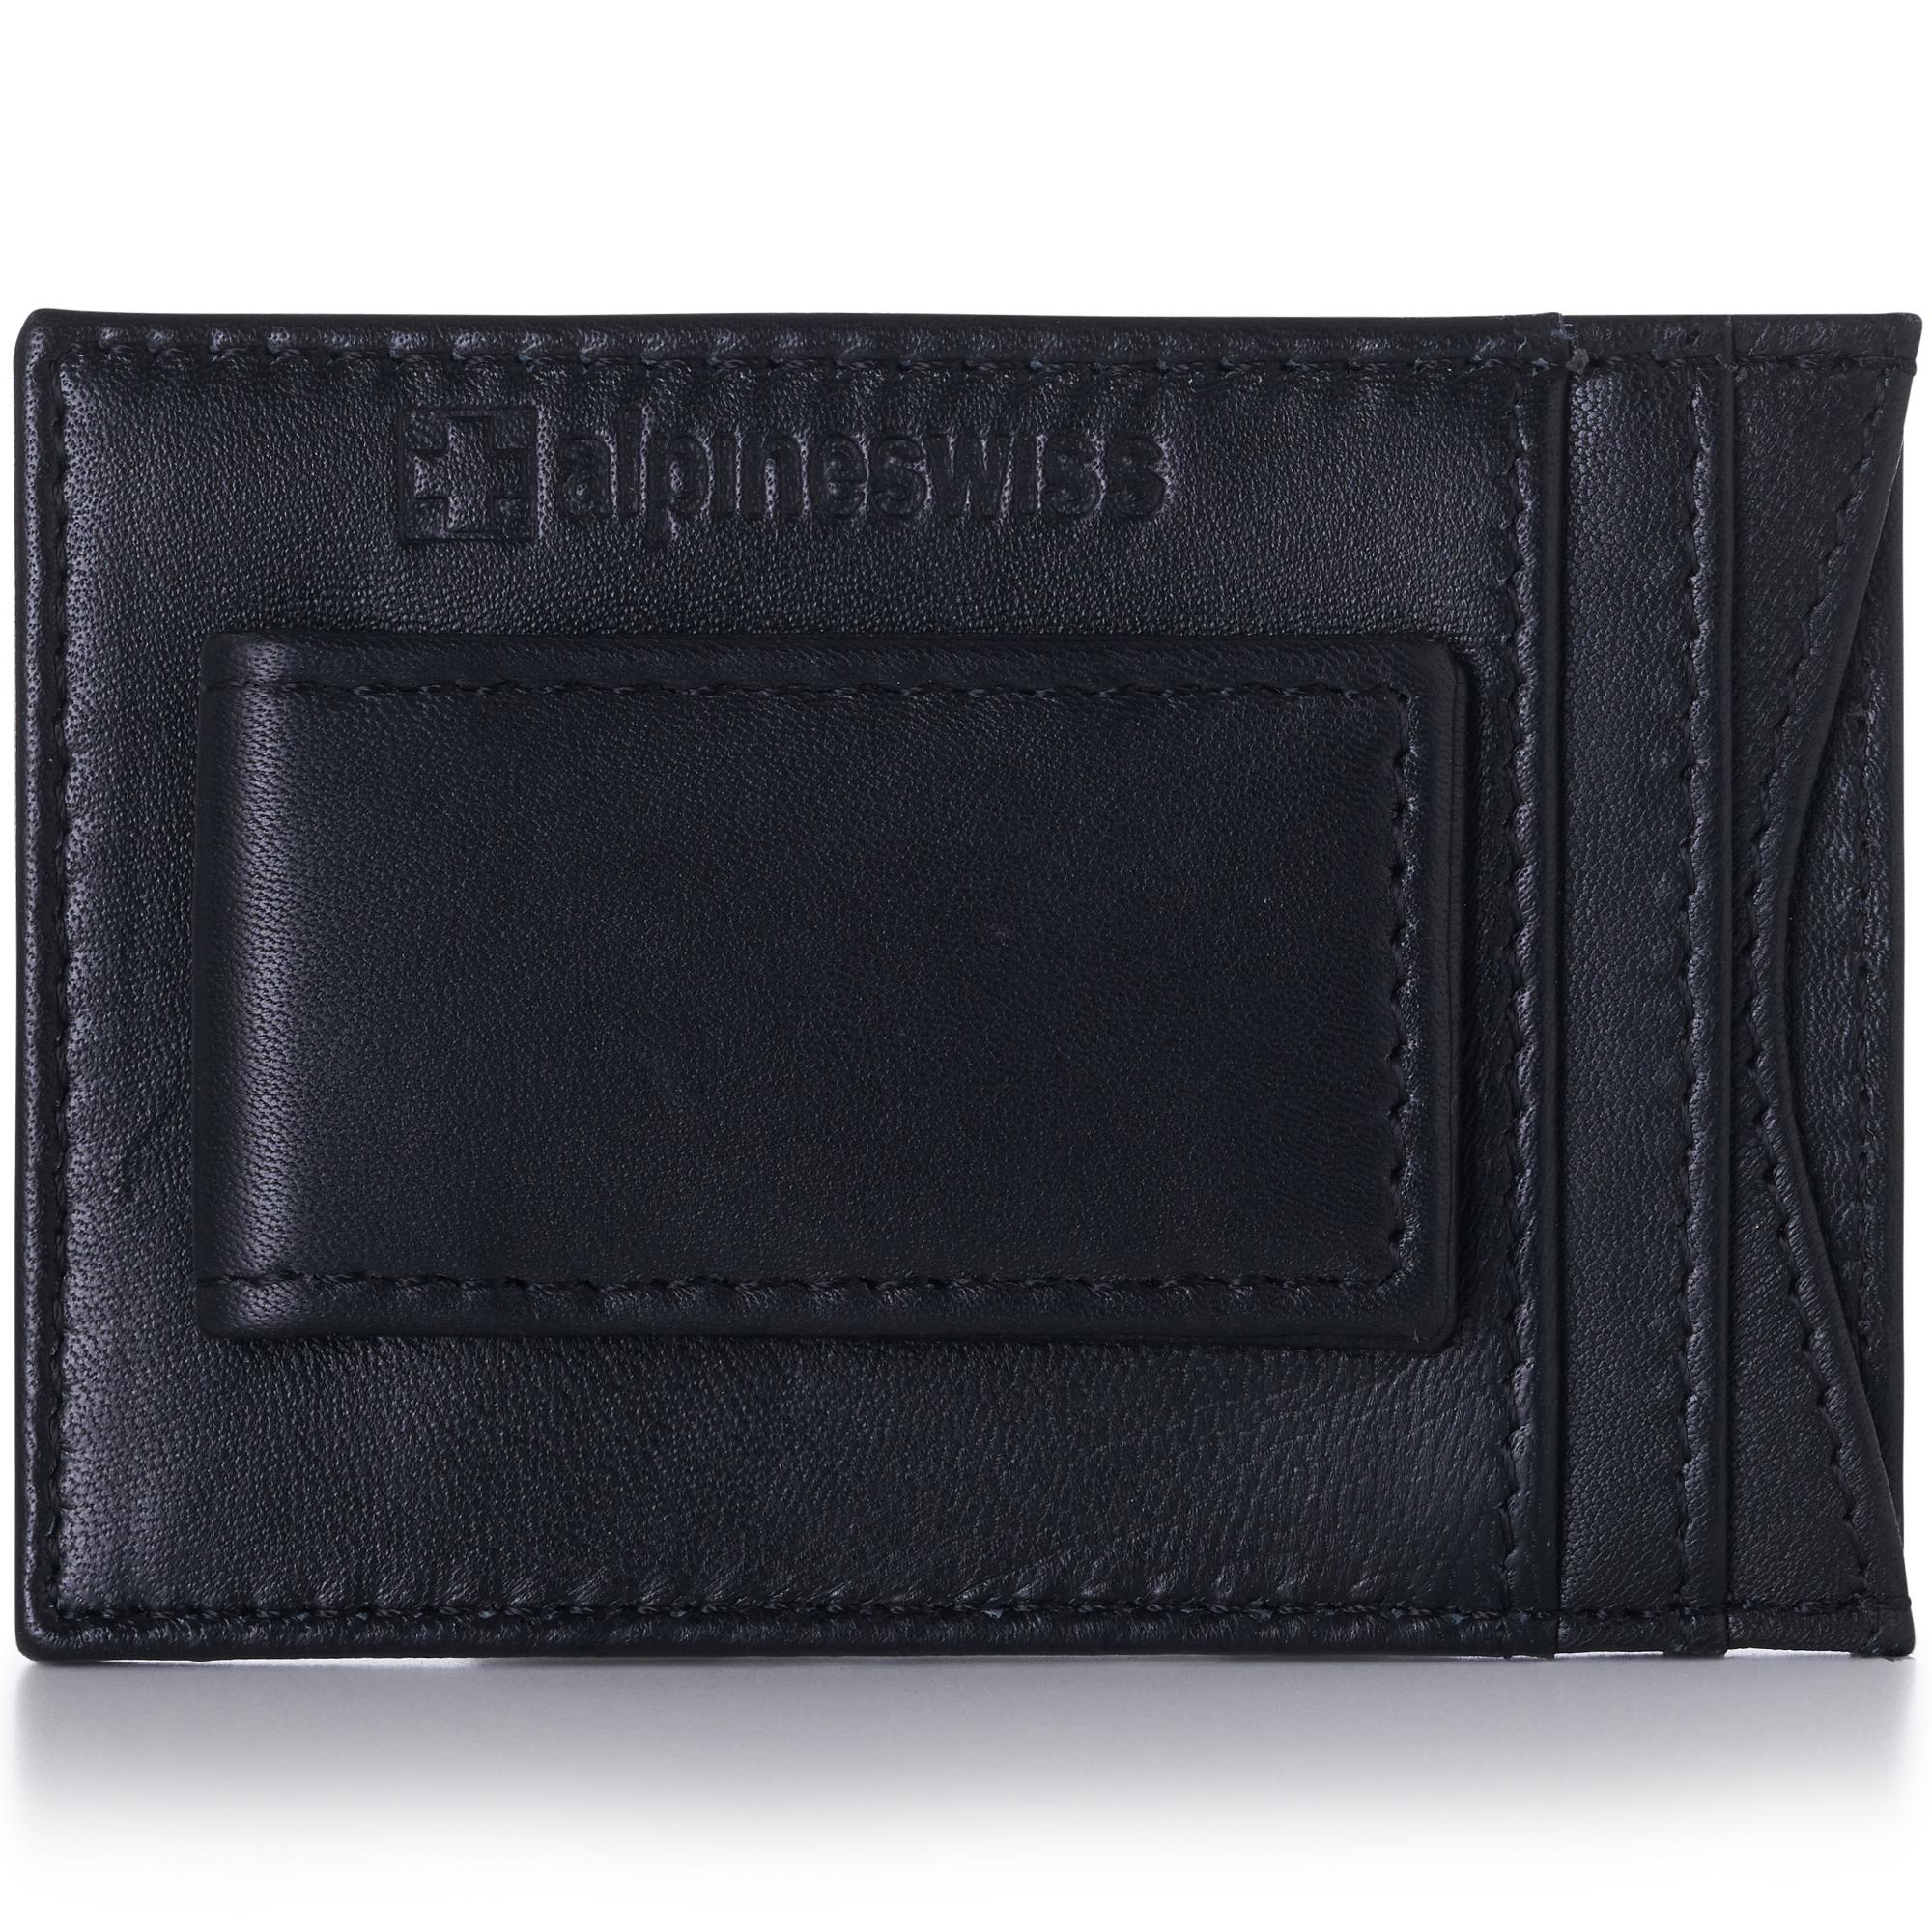 Alpine-Swiss-Mens-Leather-Wallet-Money-Clip-Bifold-Trifold-Front-Pocket-Wallets